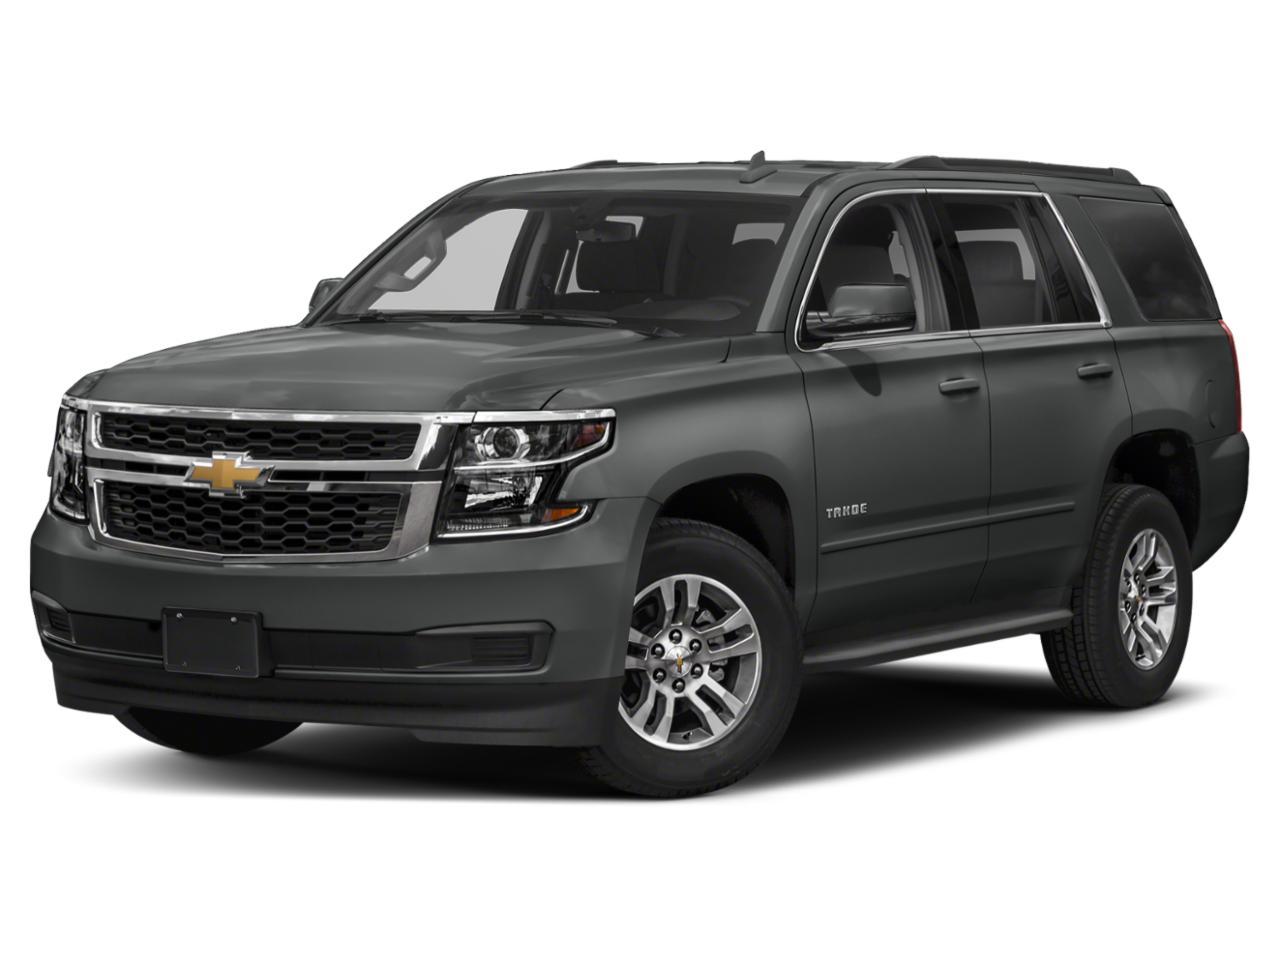 Shadow Gray Metallic 2019 Chevrolet Tahoe LS SUV Wake Forest NC